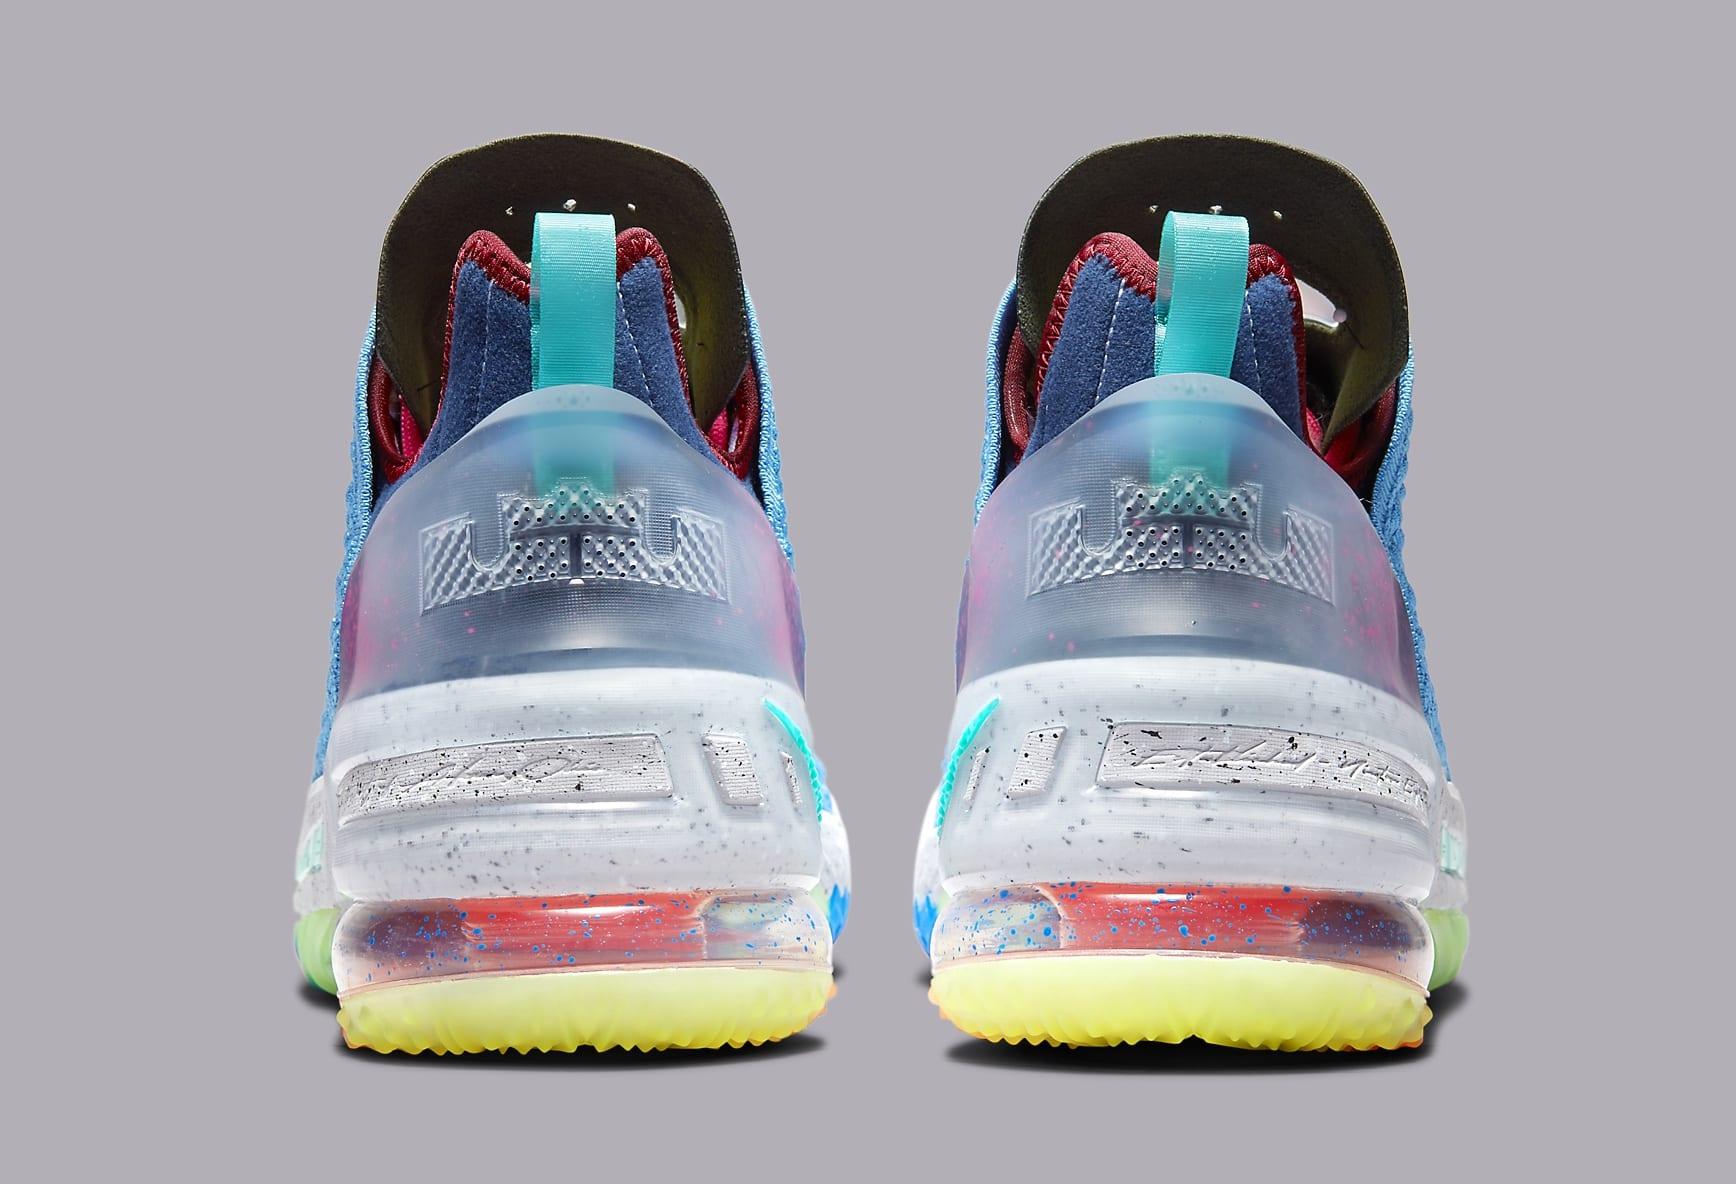 Nike LeBron 18 'Best 1-9' DM2813 400 Heel